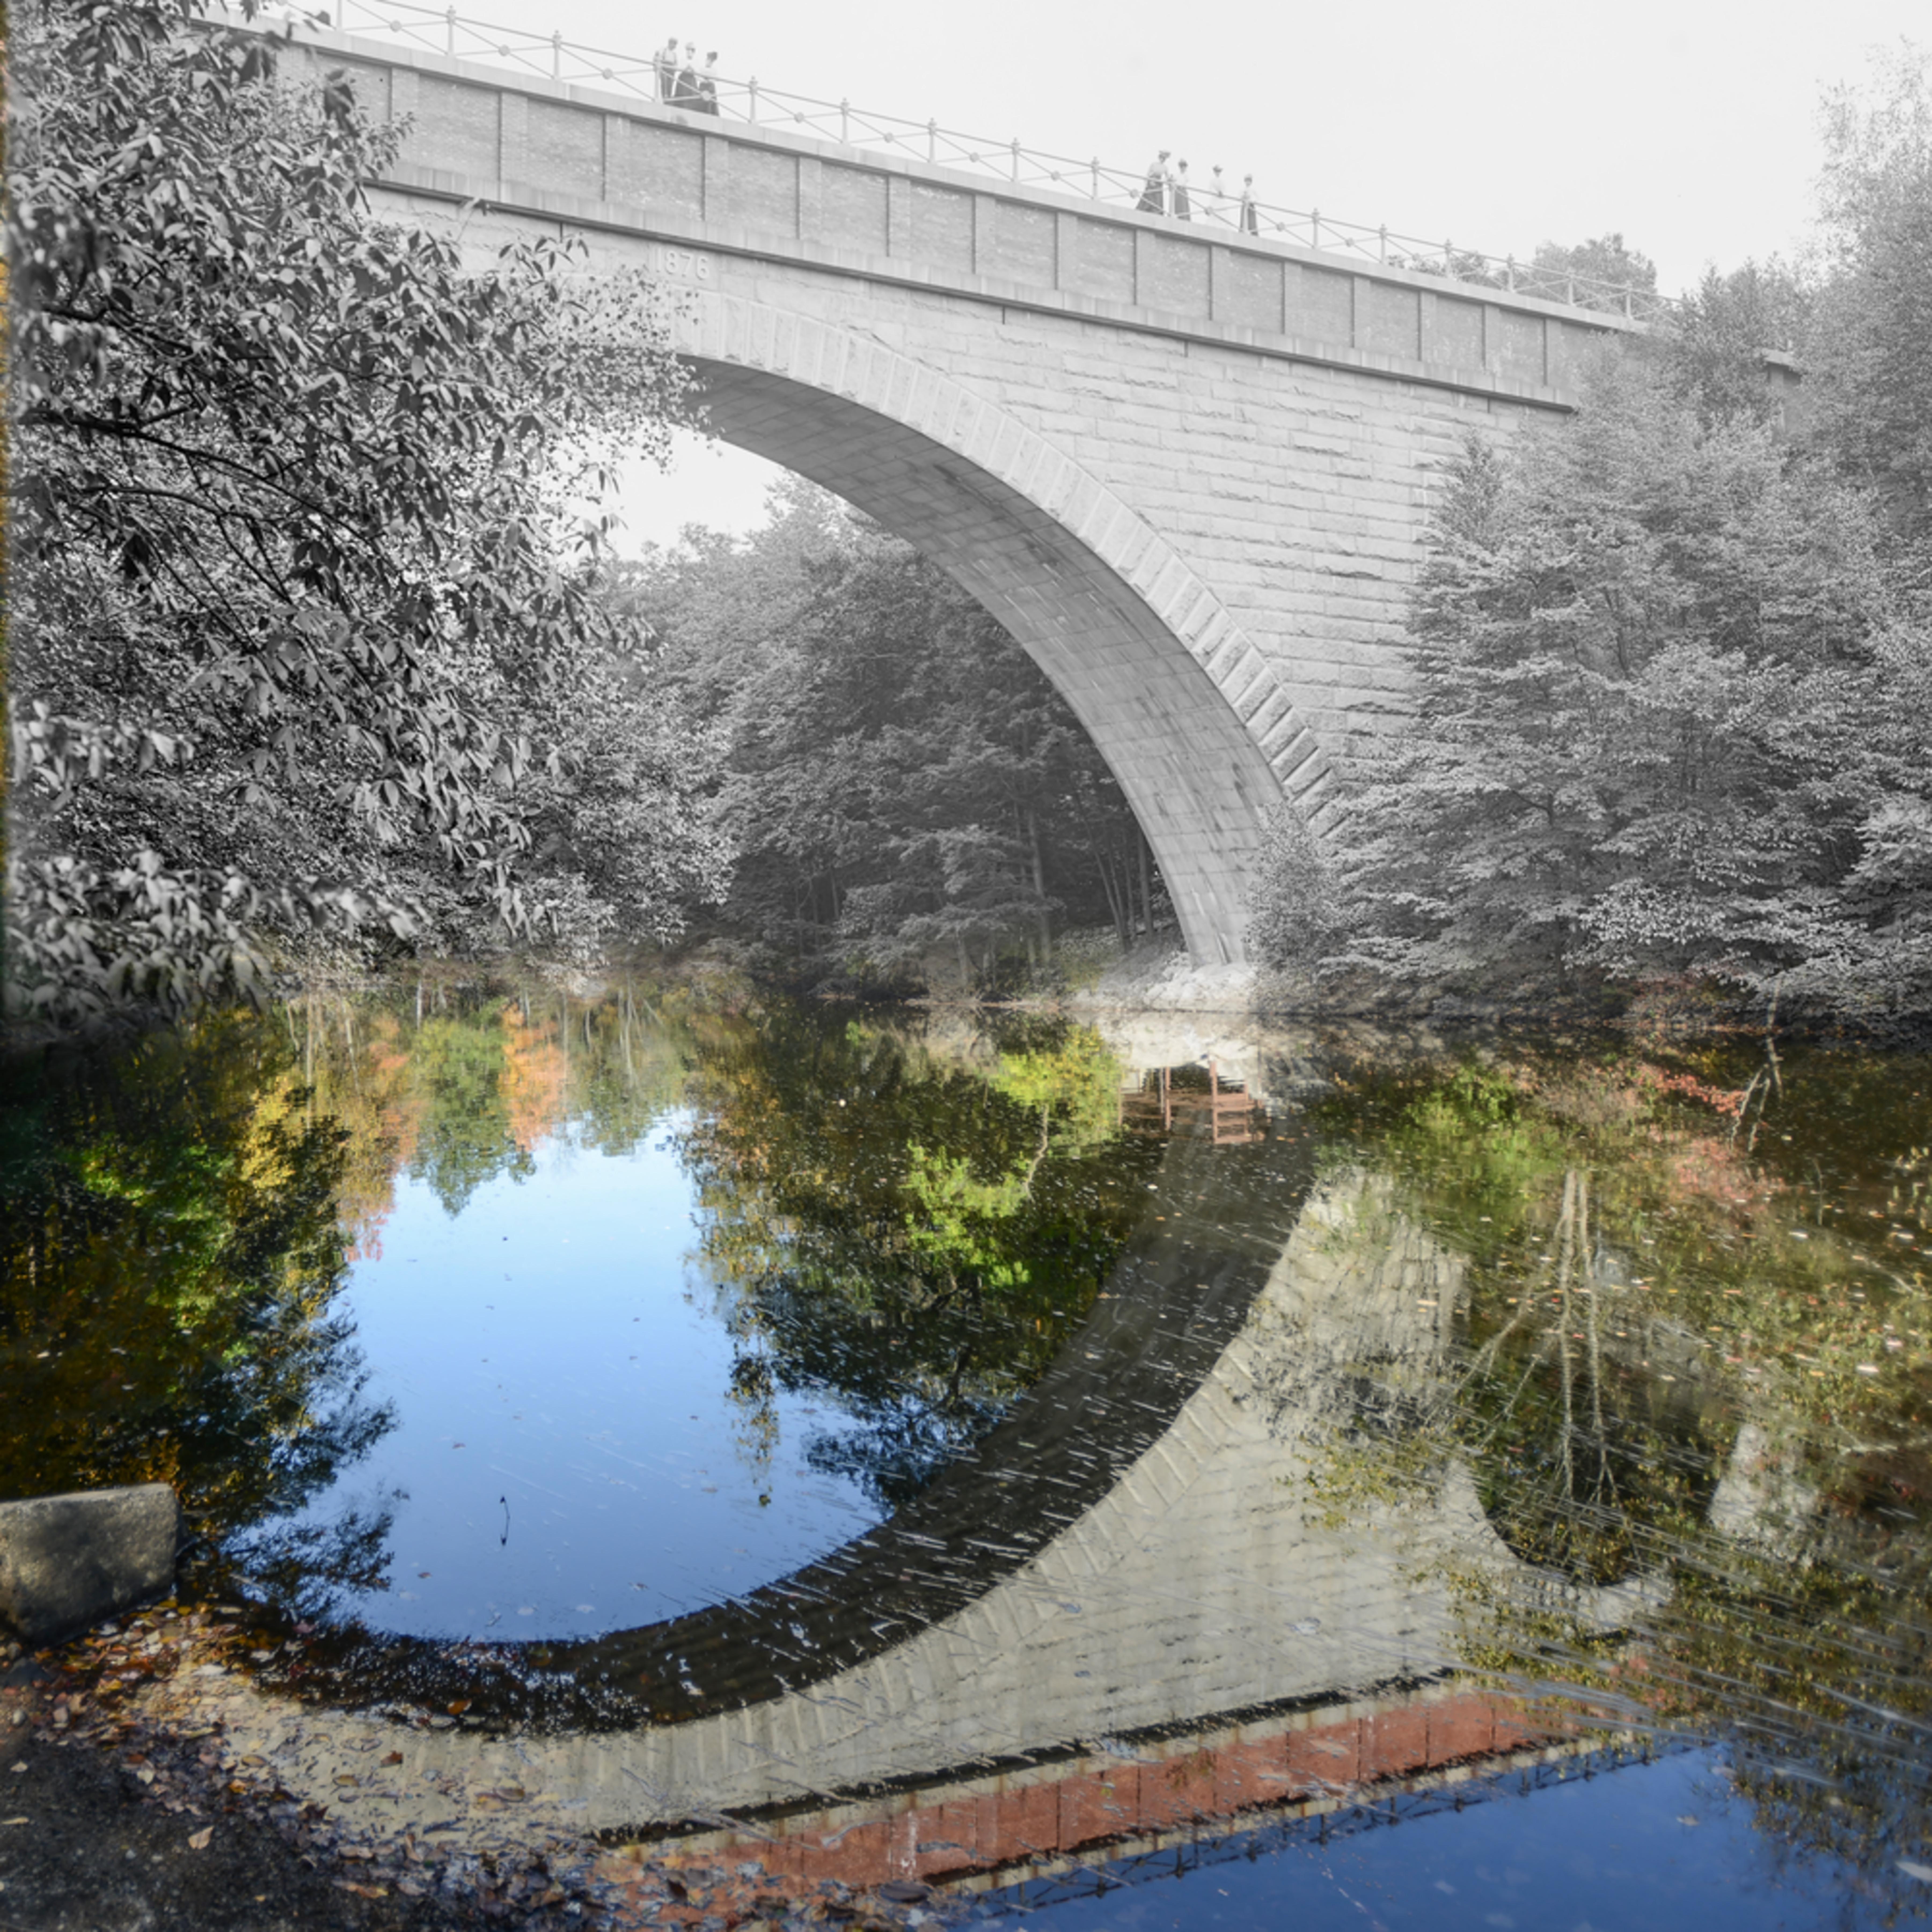 Dsc 8895 echo bridge charles river newton mass. 24x30 ggfam3